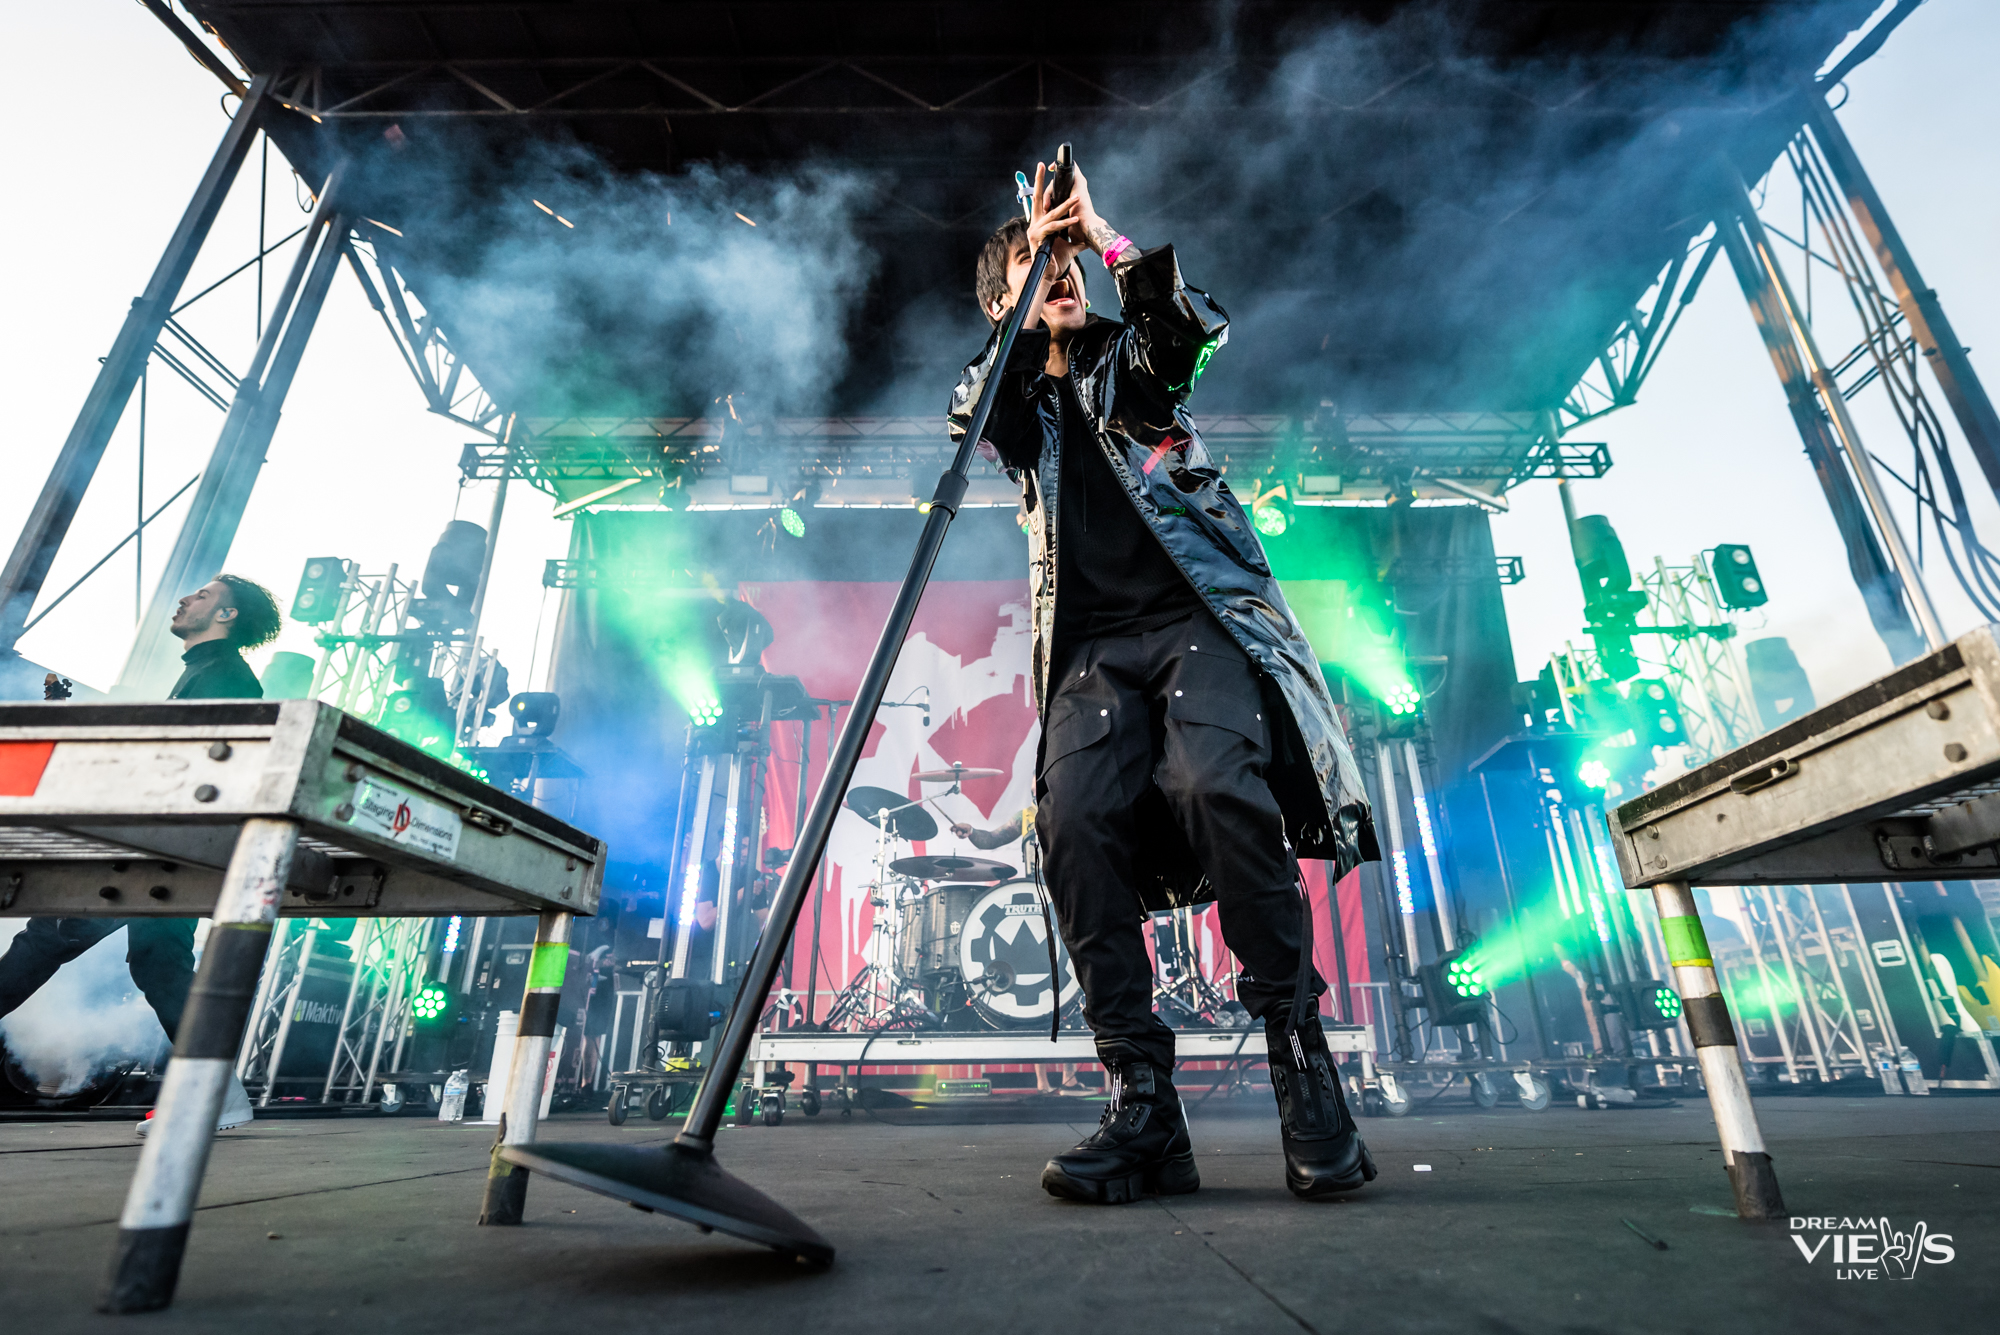 Crown The Empire Concert — Dream Views Live